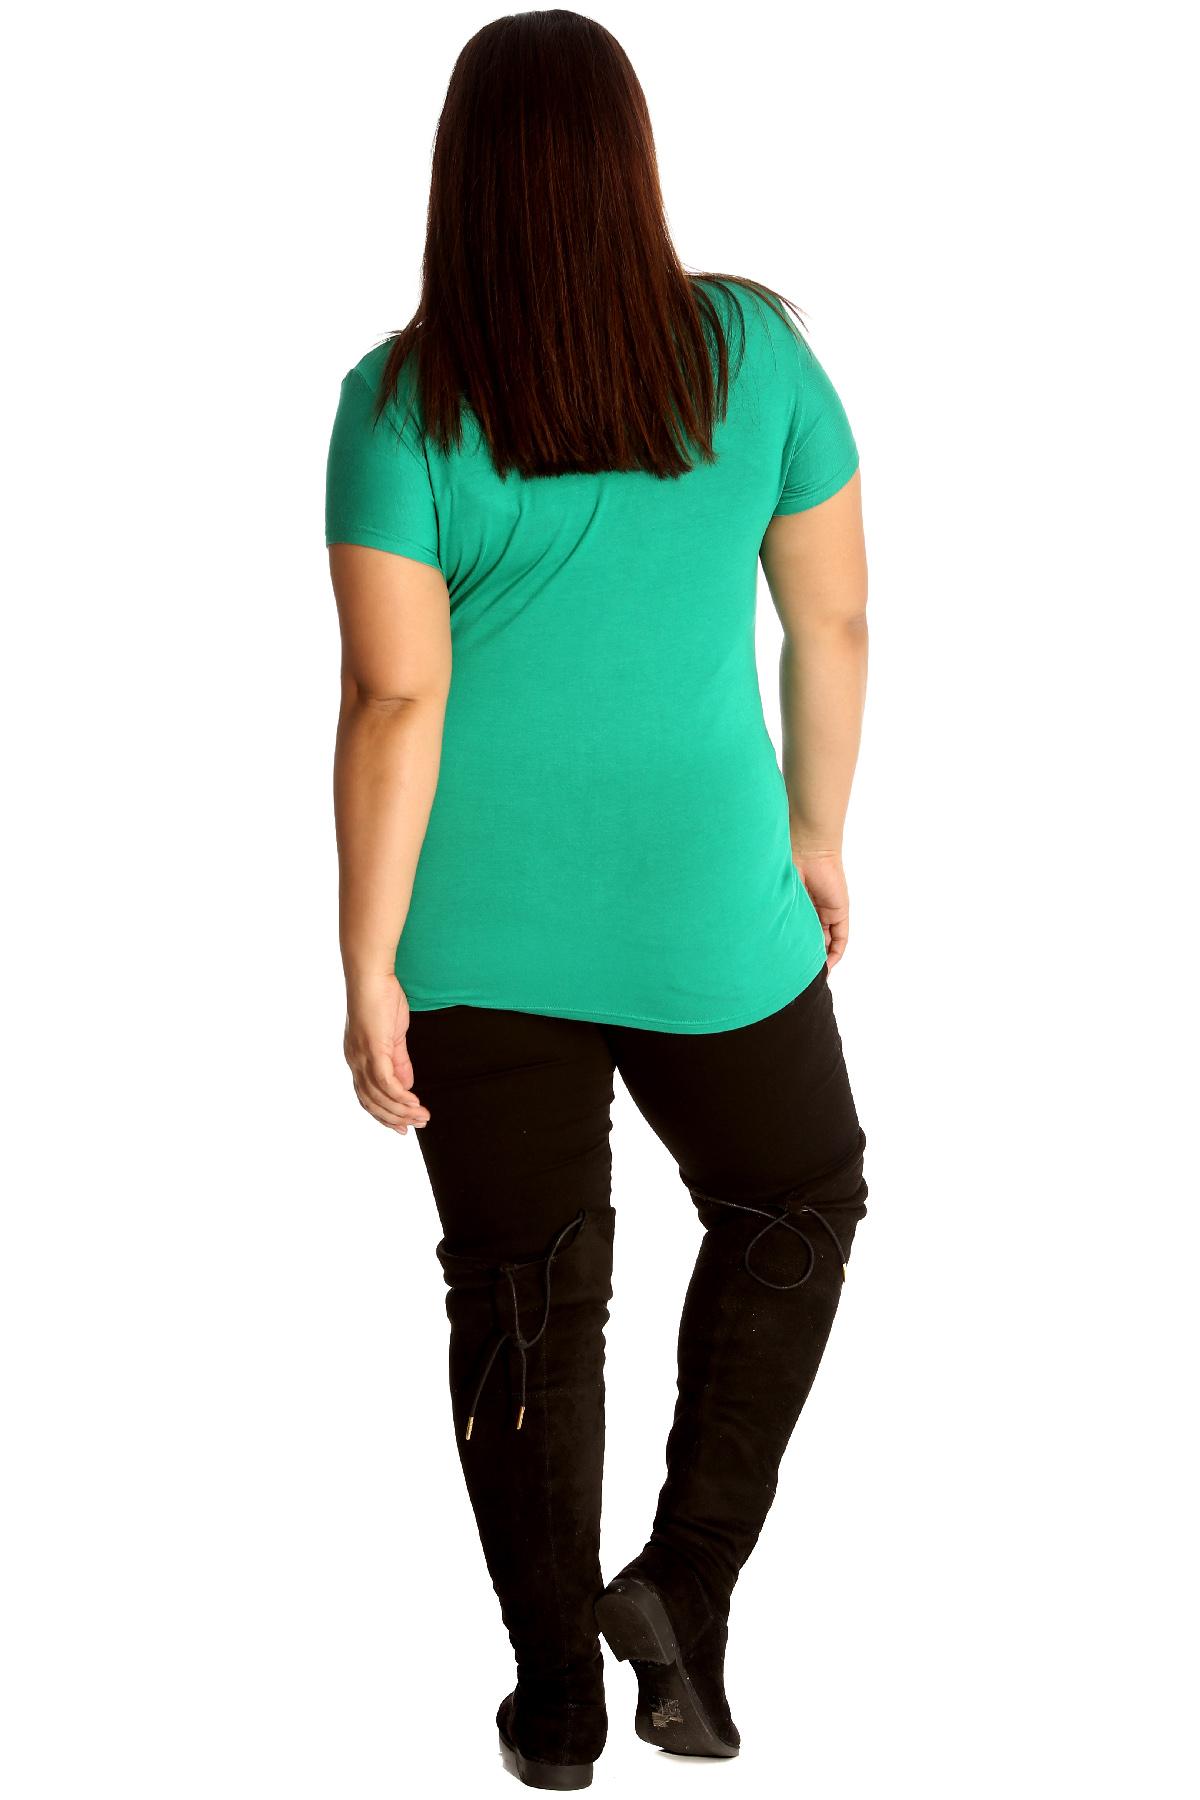 New Women Plus Size Top Ladies T Shirt Mistletoe Christmas